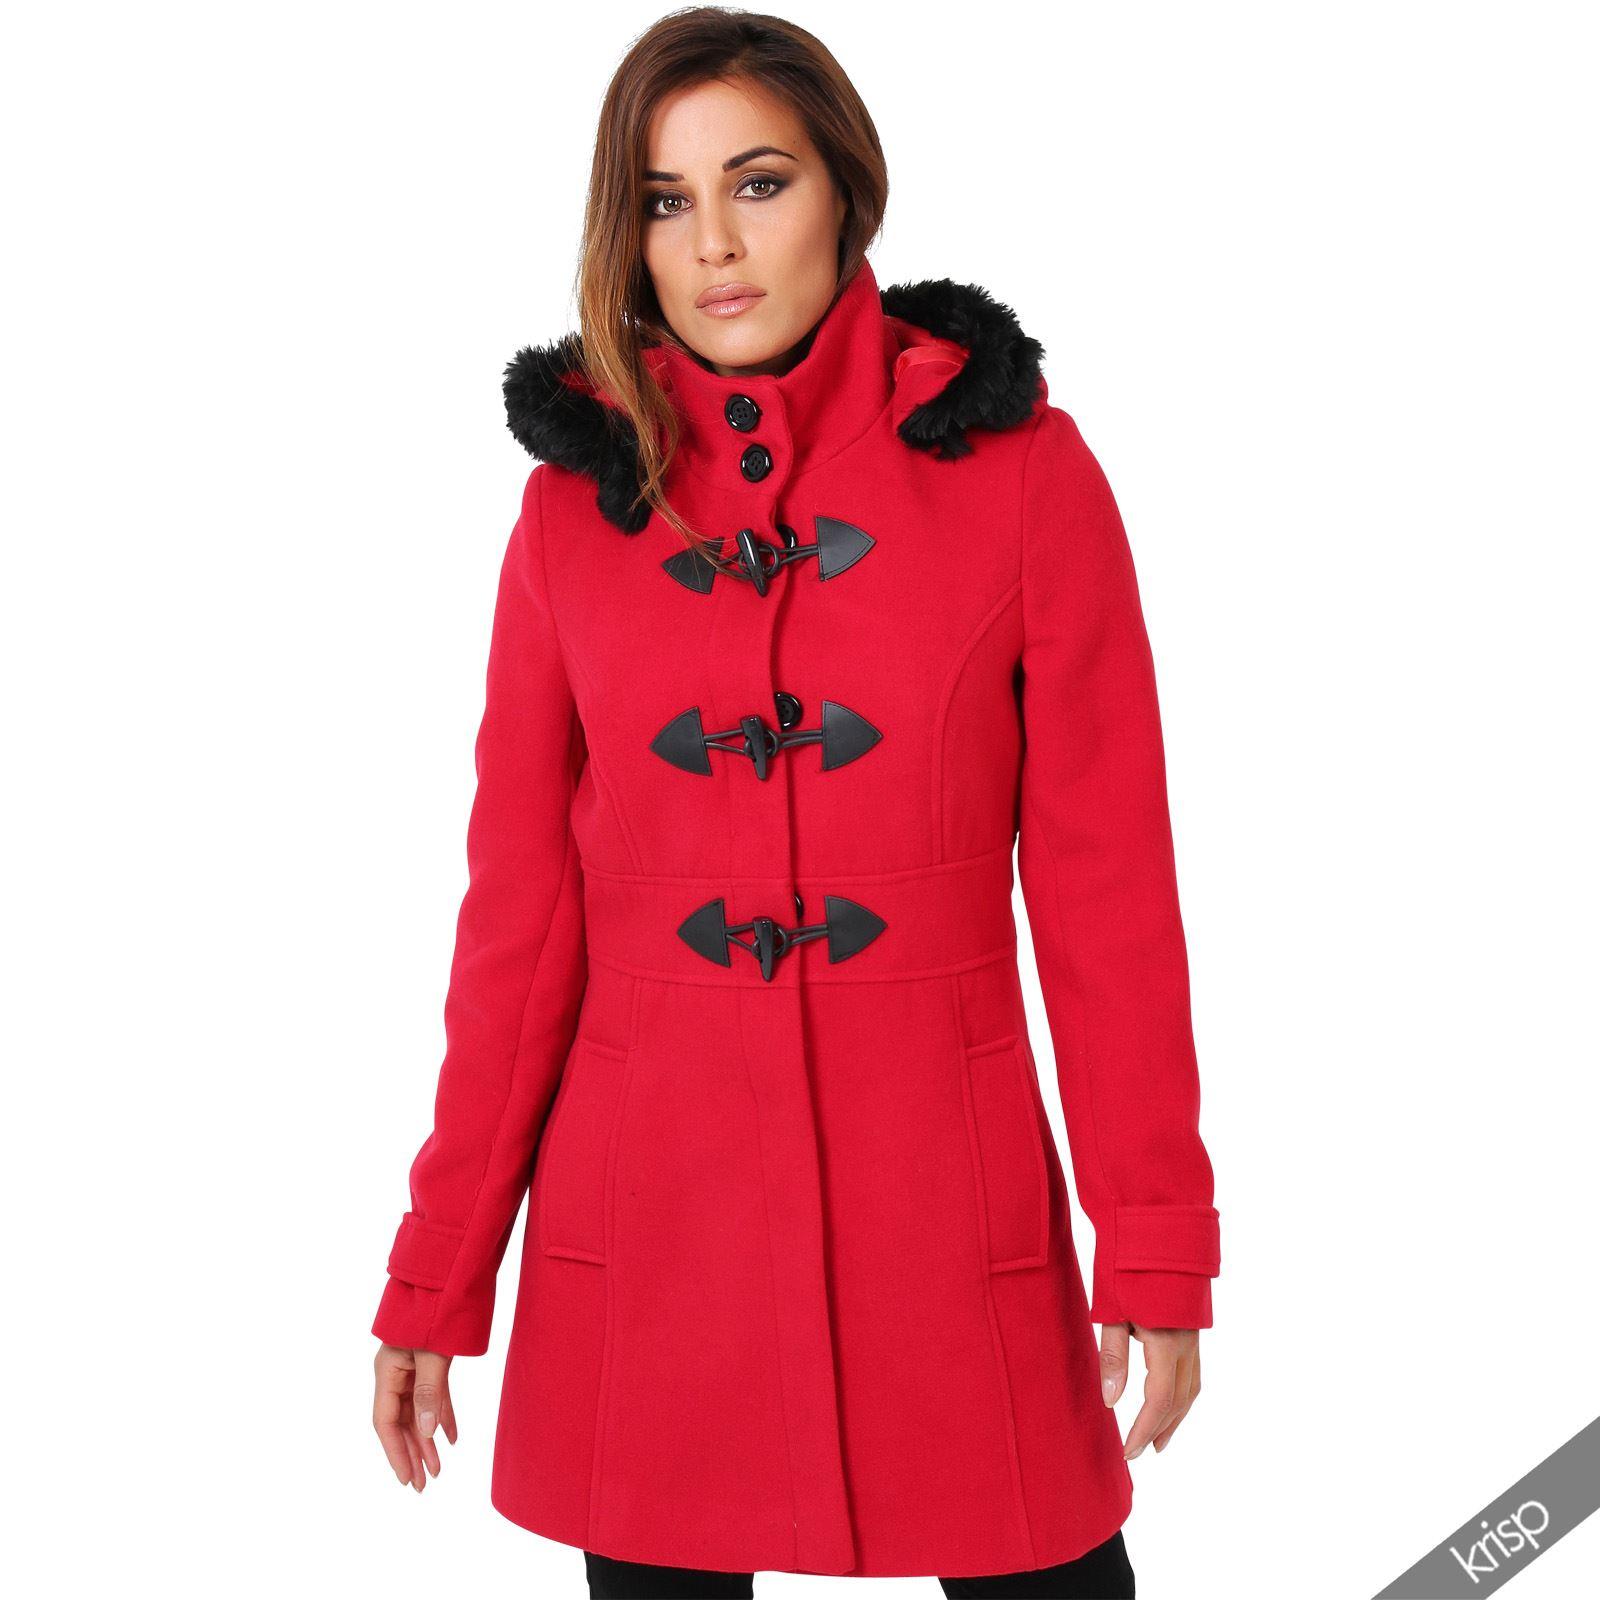 women detachable hood 2 in 1 jacket wool fleece toggle duffle coat trench winter ebay. Black Bedroom Furniture Sets. Home Design Ideas